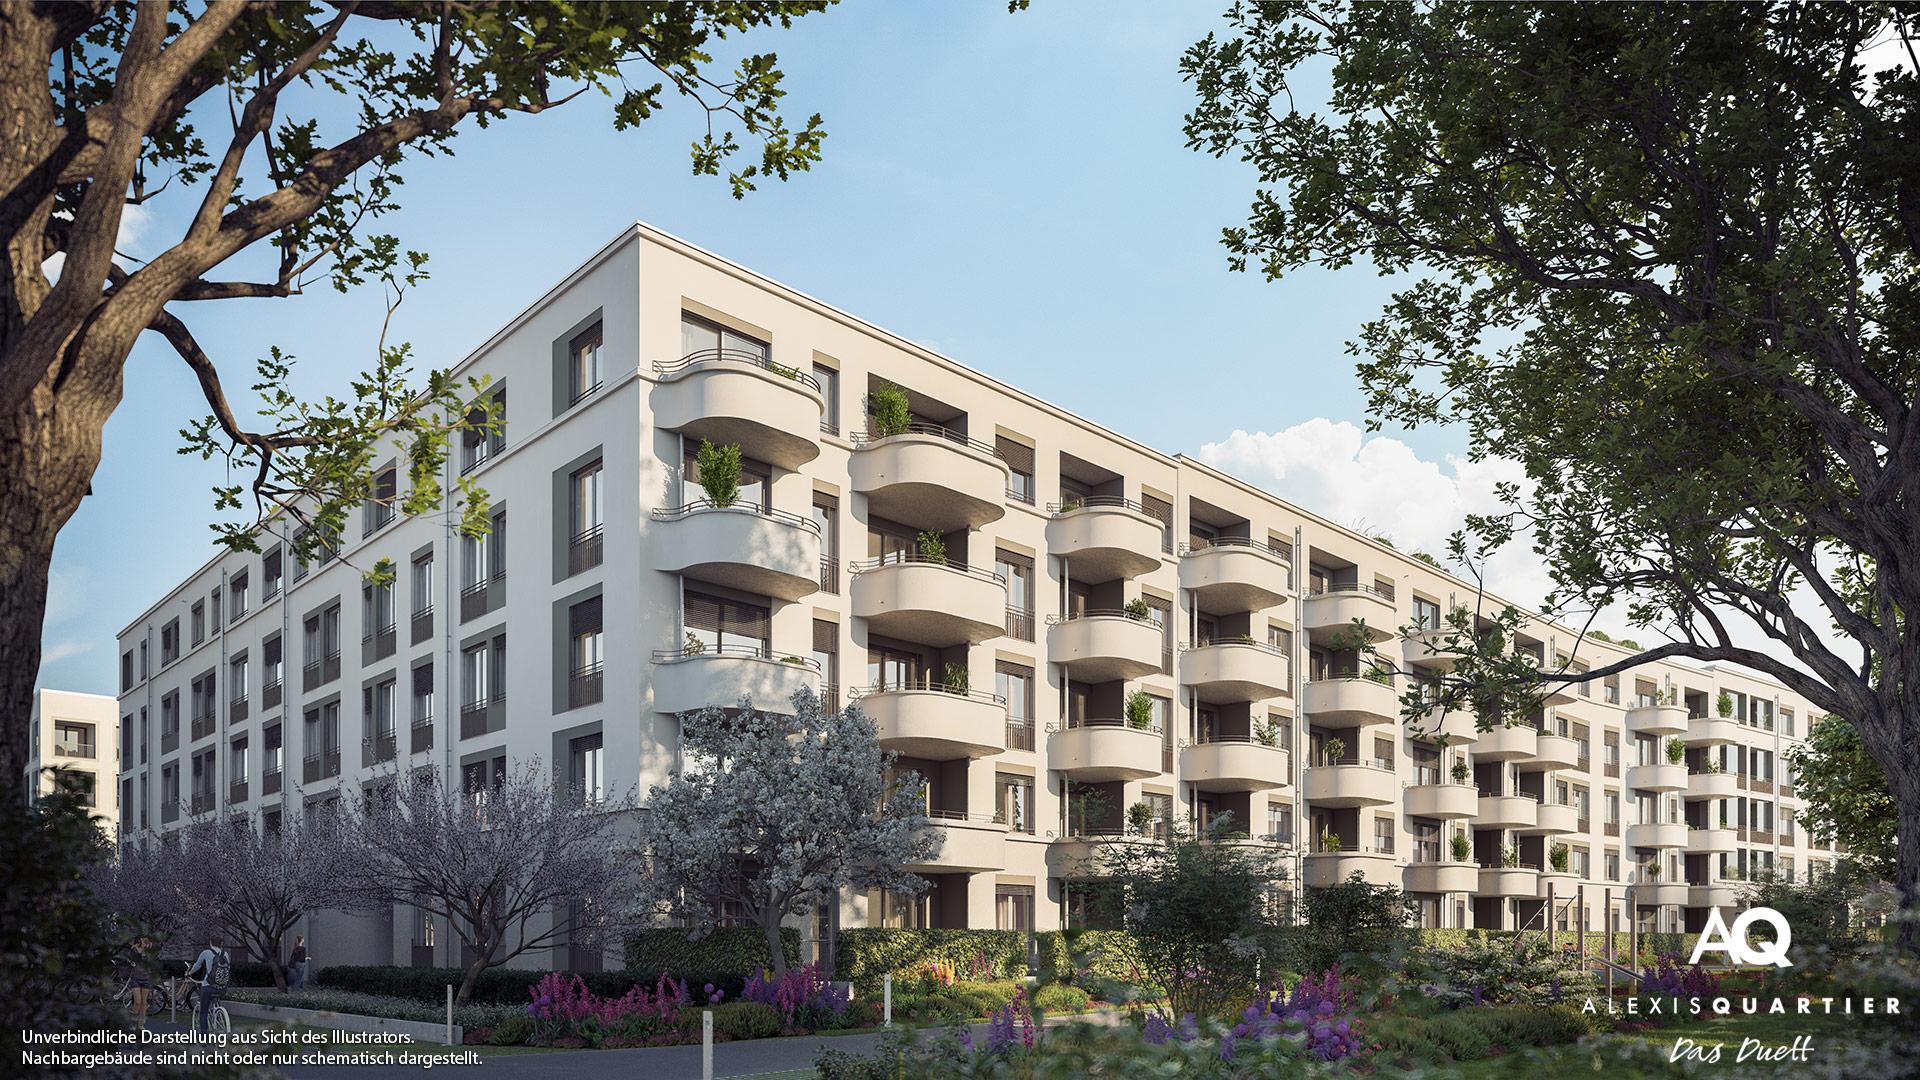 Immobilie Alexisquartier - Das Duett - Illustration 2